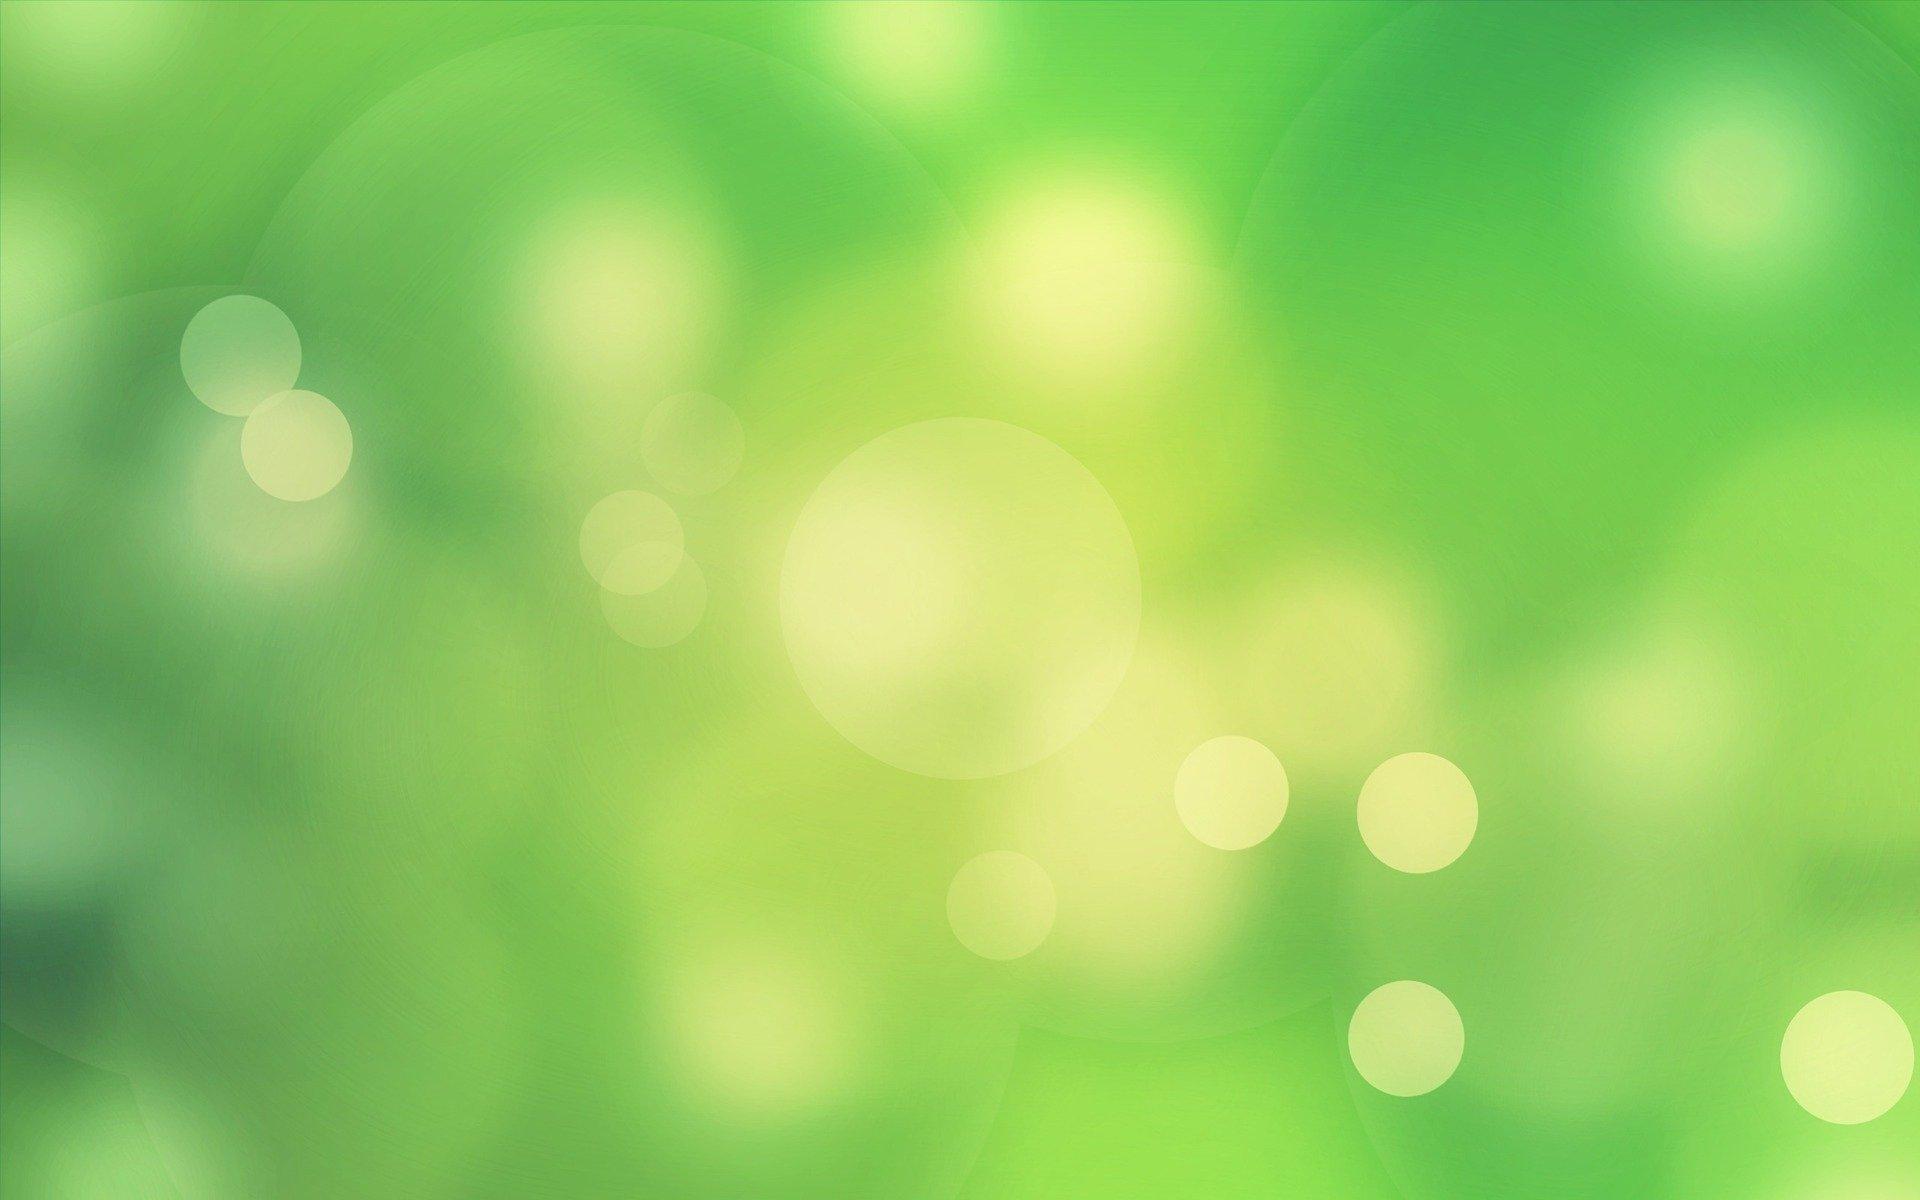 Green Hd Wallpaper Background Image 1920x1200 Id